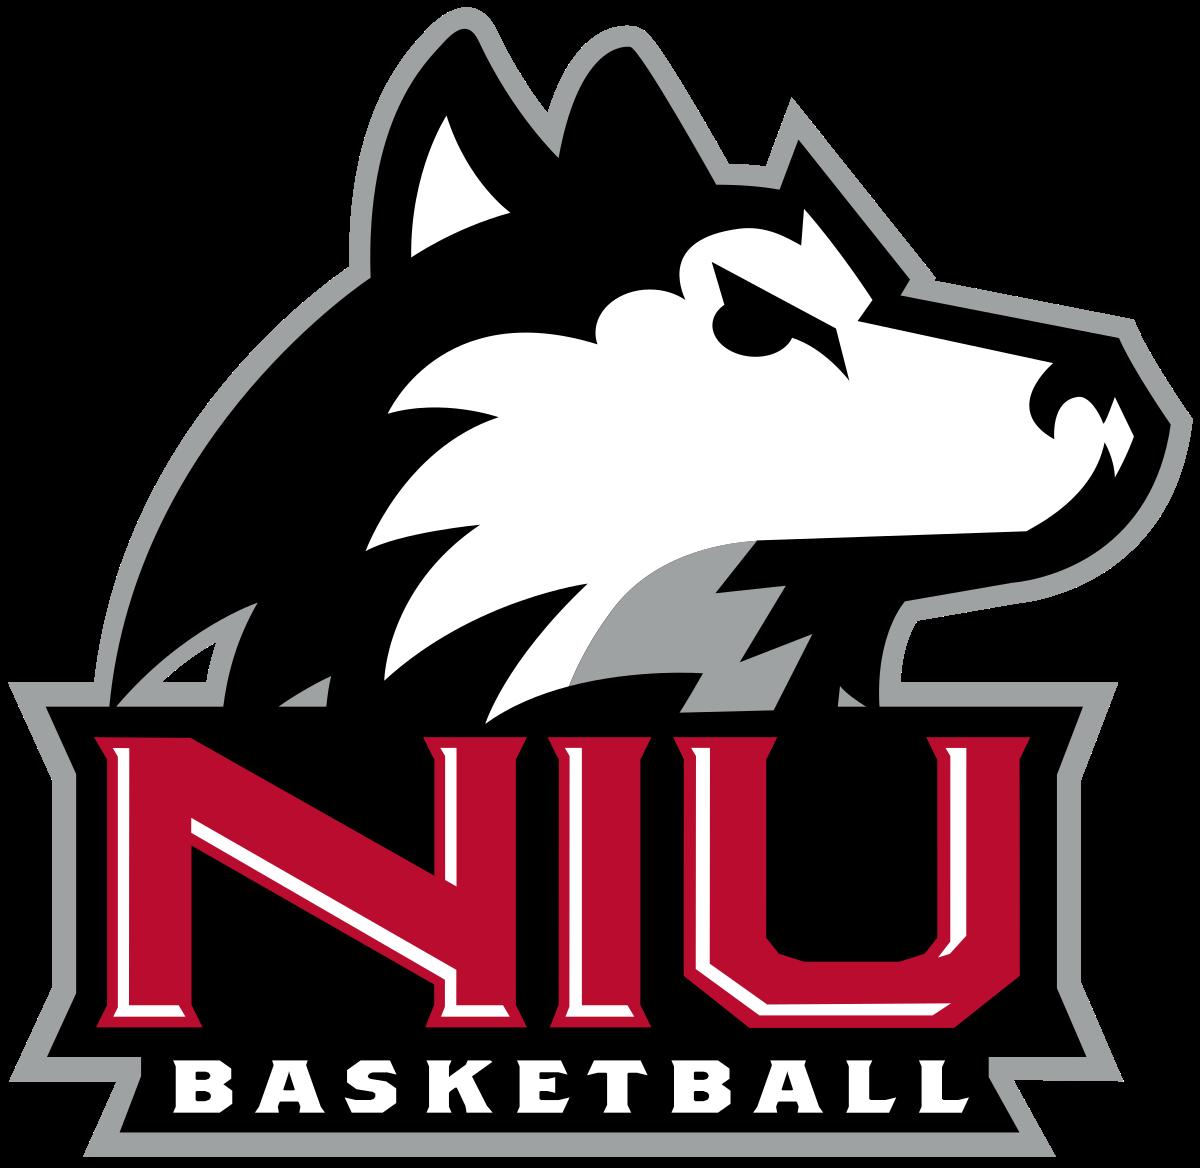 Girls basketball logo clipart clip transparent download Northern Illinois Huskies women's basketball - Wikipedia clip transparent download